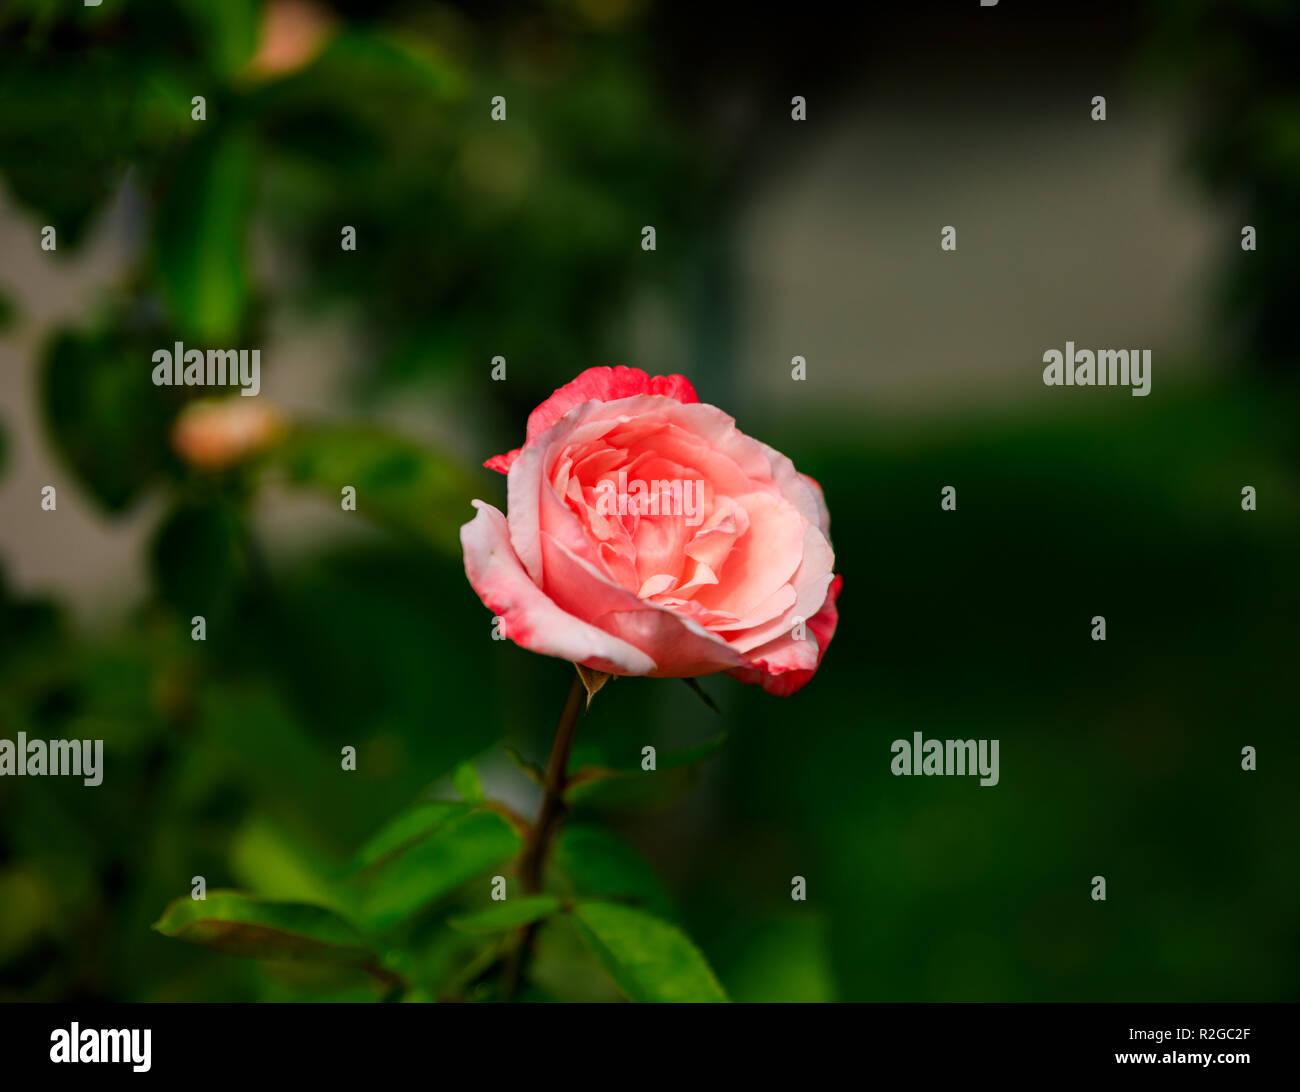 big rose auf gr n mit dunklem hintergrund natur makro herbst foto stockfoto bild 225324807. Black Bedroom Furniture Sets. Home Design Ideas